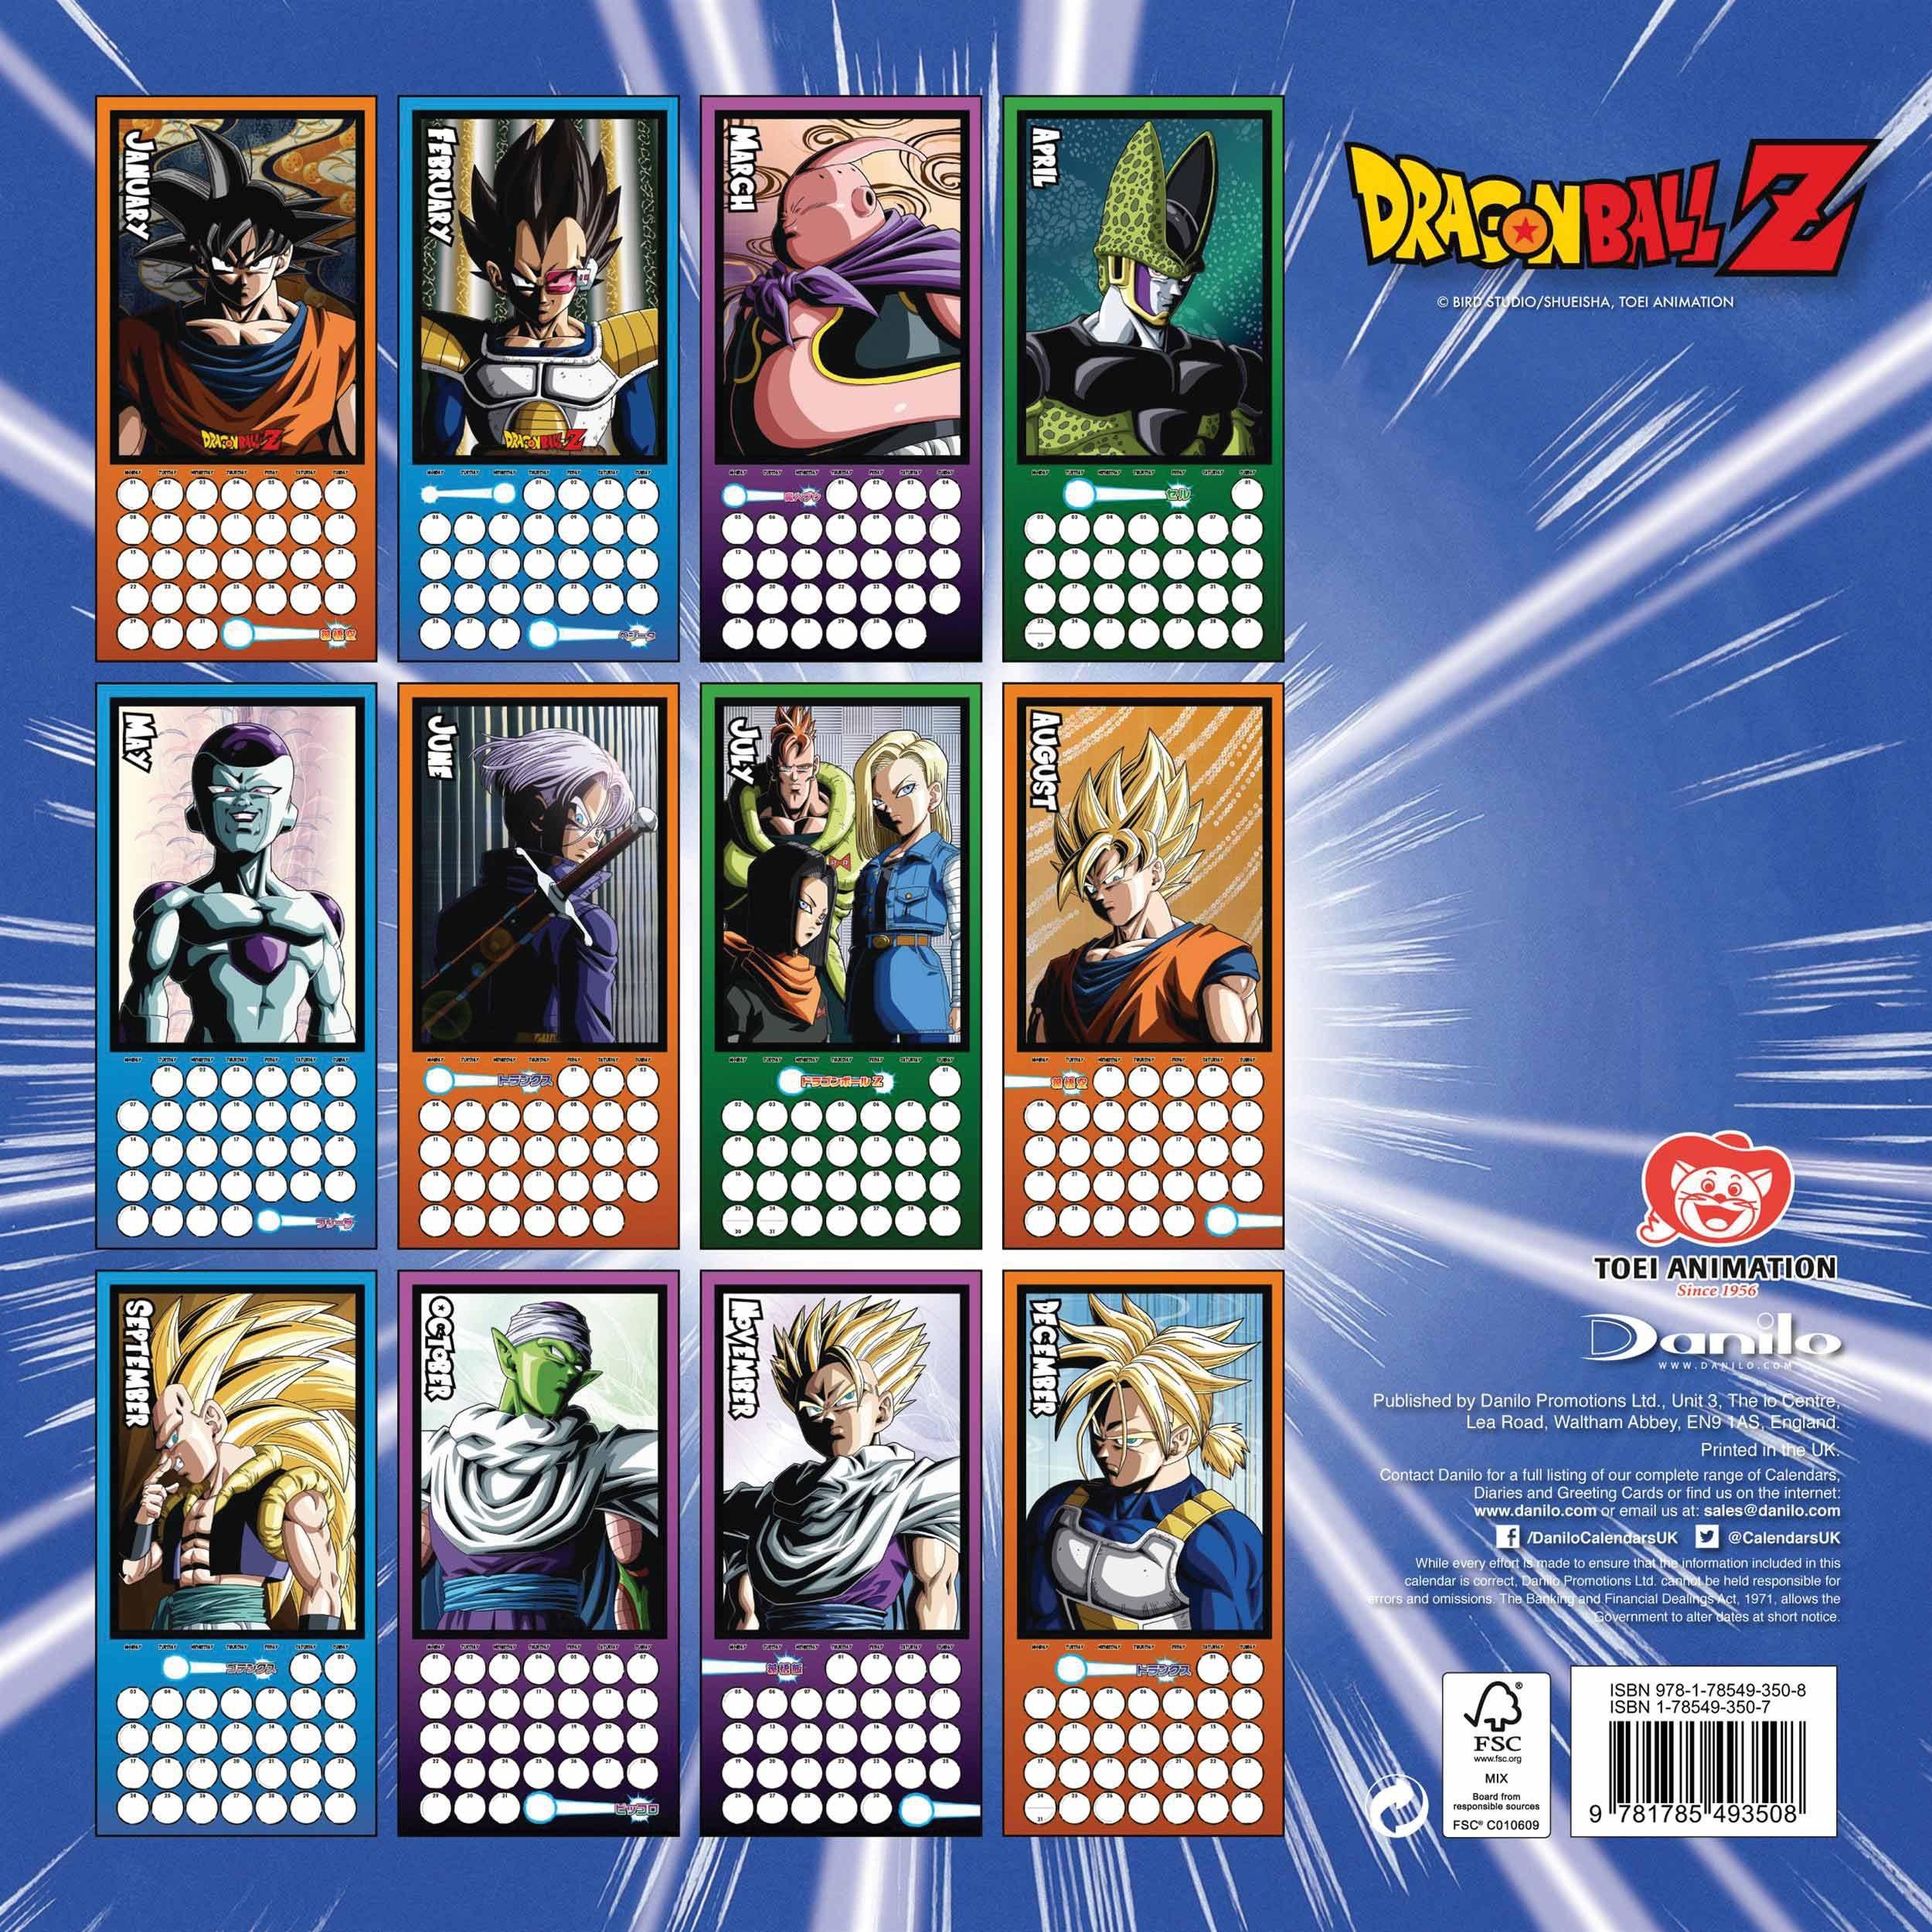 Dragon Ball Z Official Wall Calendar 2018 – Square Format, 2018 Wall Dragon Ball Z Calendar 2019